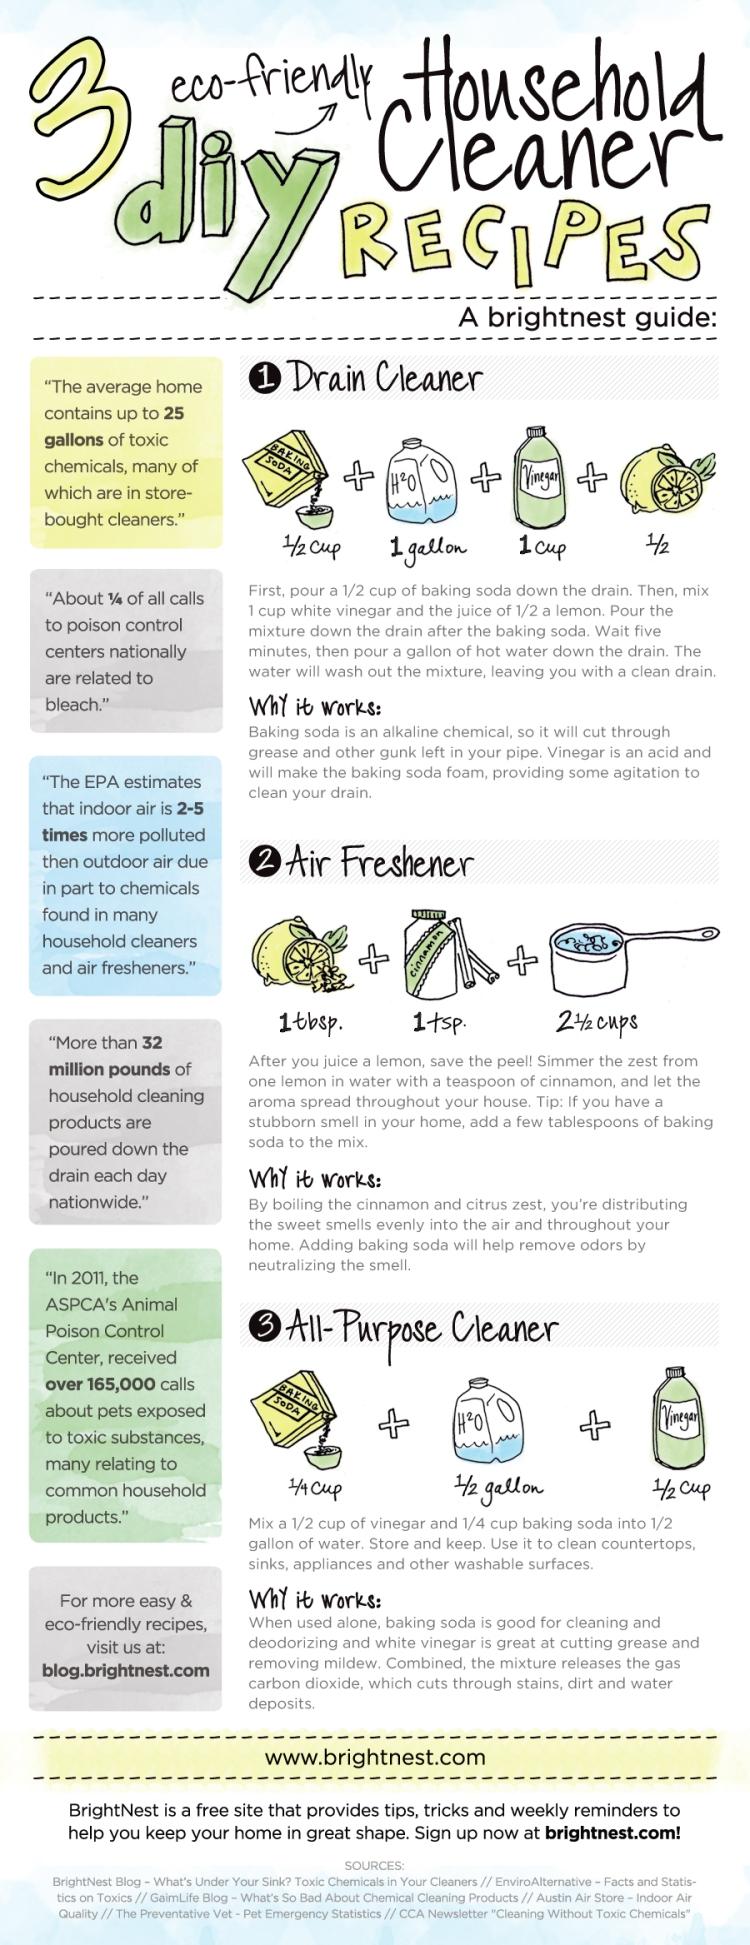 BrightNest_DIY_EcoFriendly_Household_Cleaner_Recipes